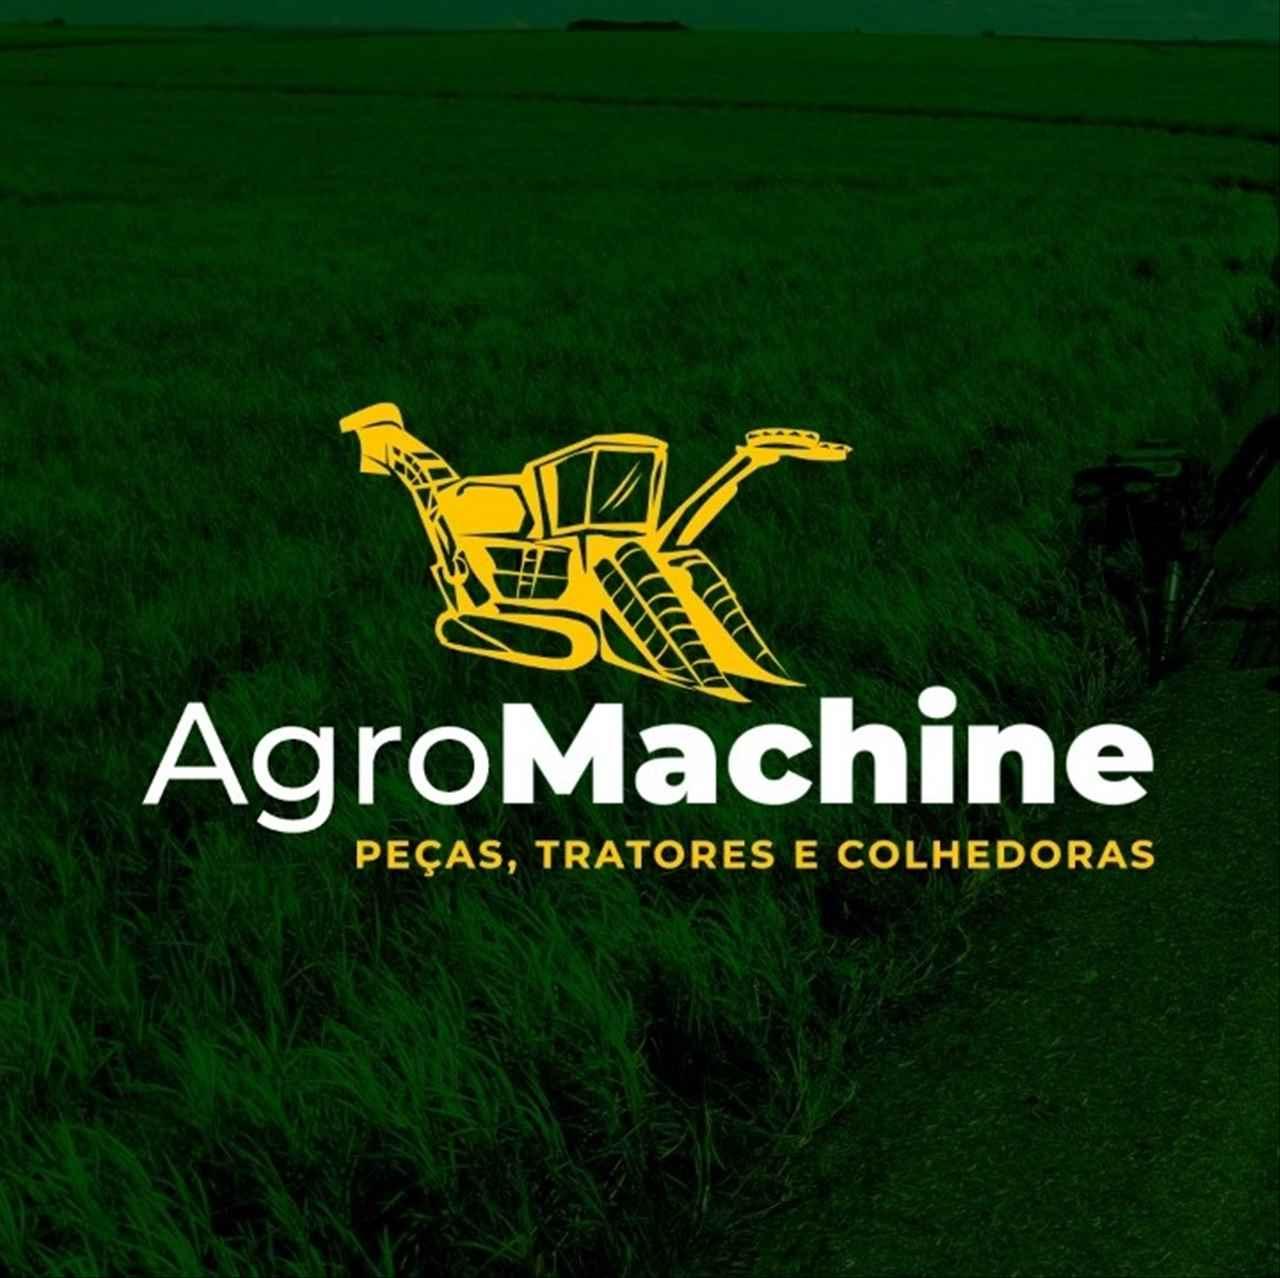 Foto da Loja da AgroMachine